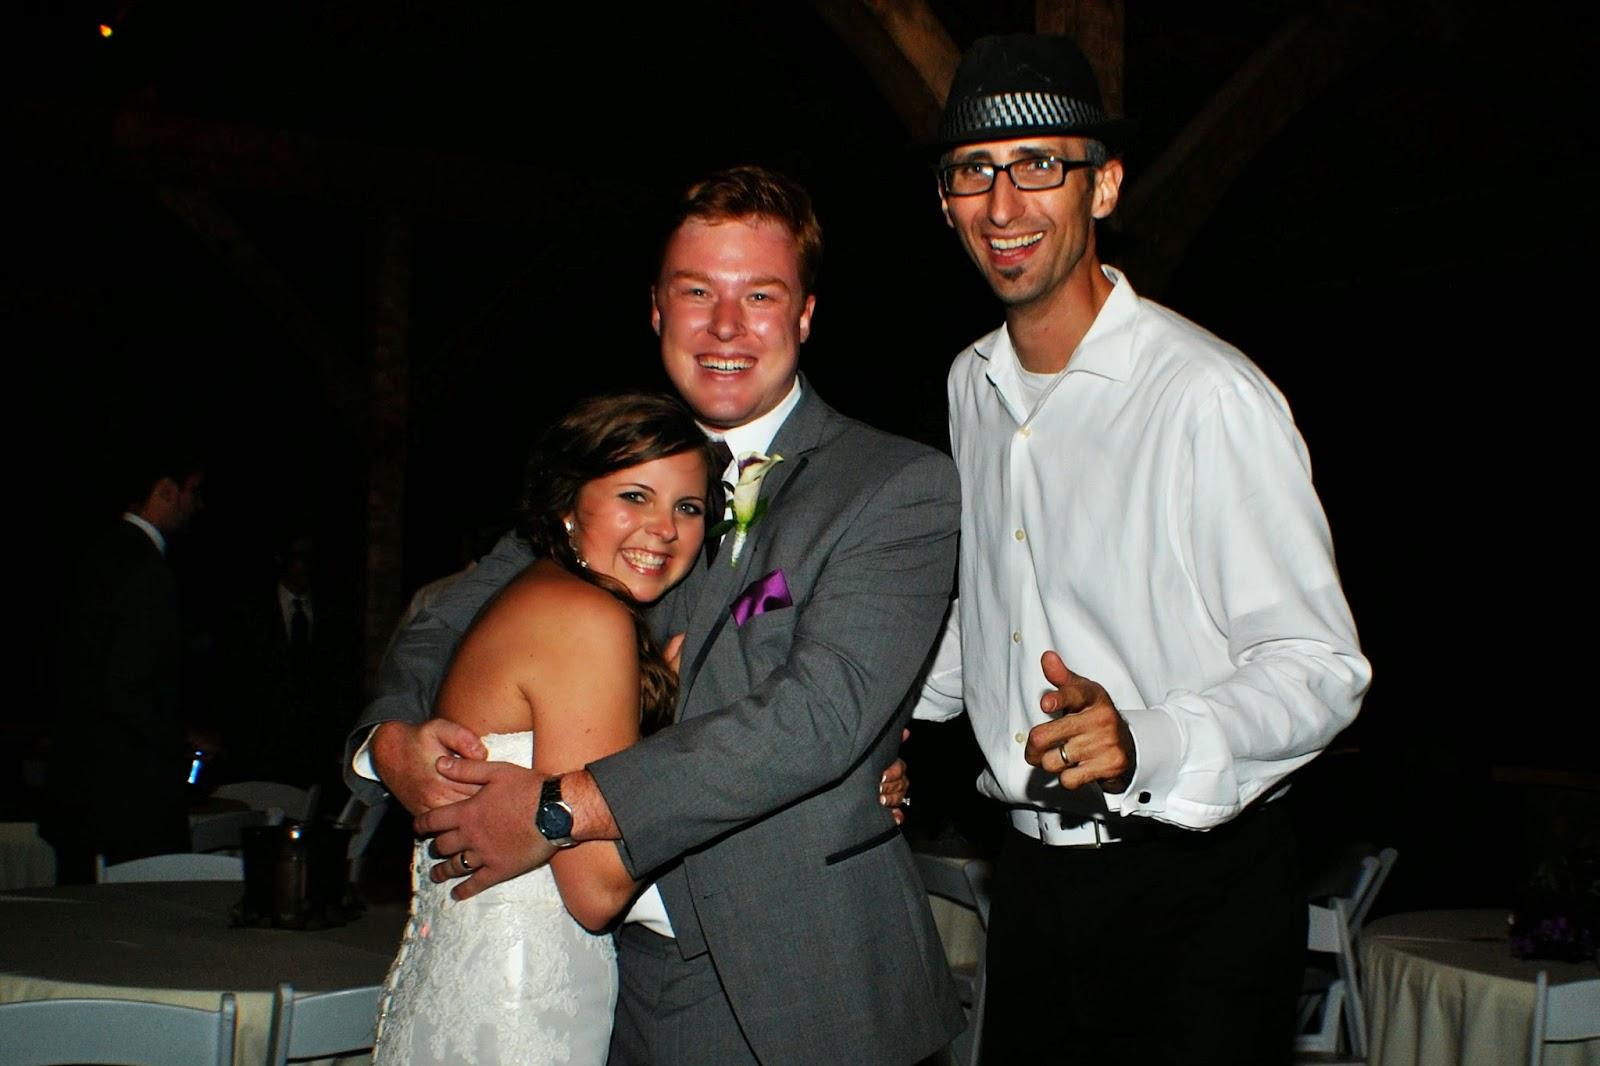 With Class LLC Wedding Coordination Party DJ - DeBarge Vineyard & Winery - Chattanooga, TN - DJ Mark